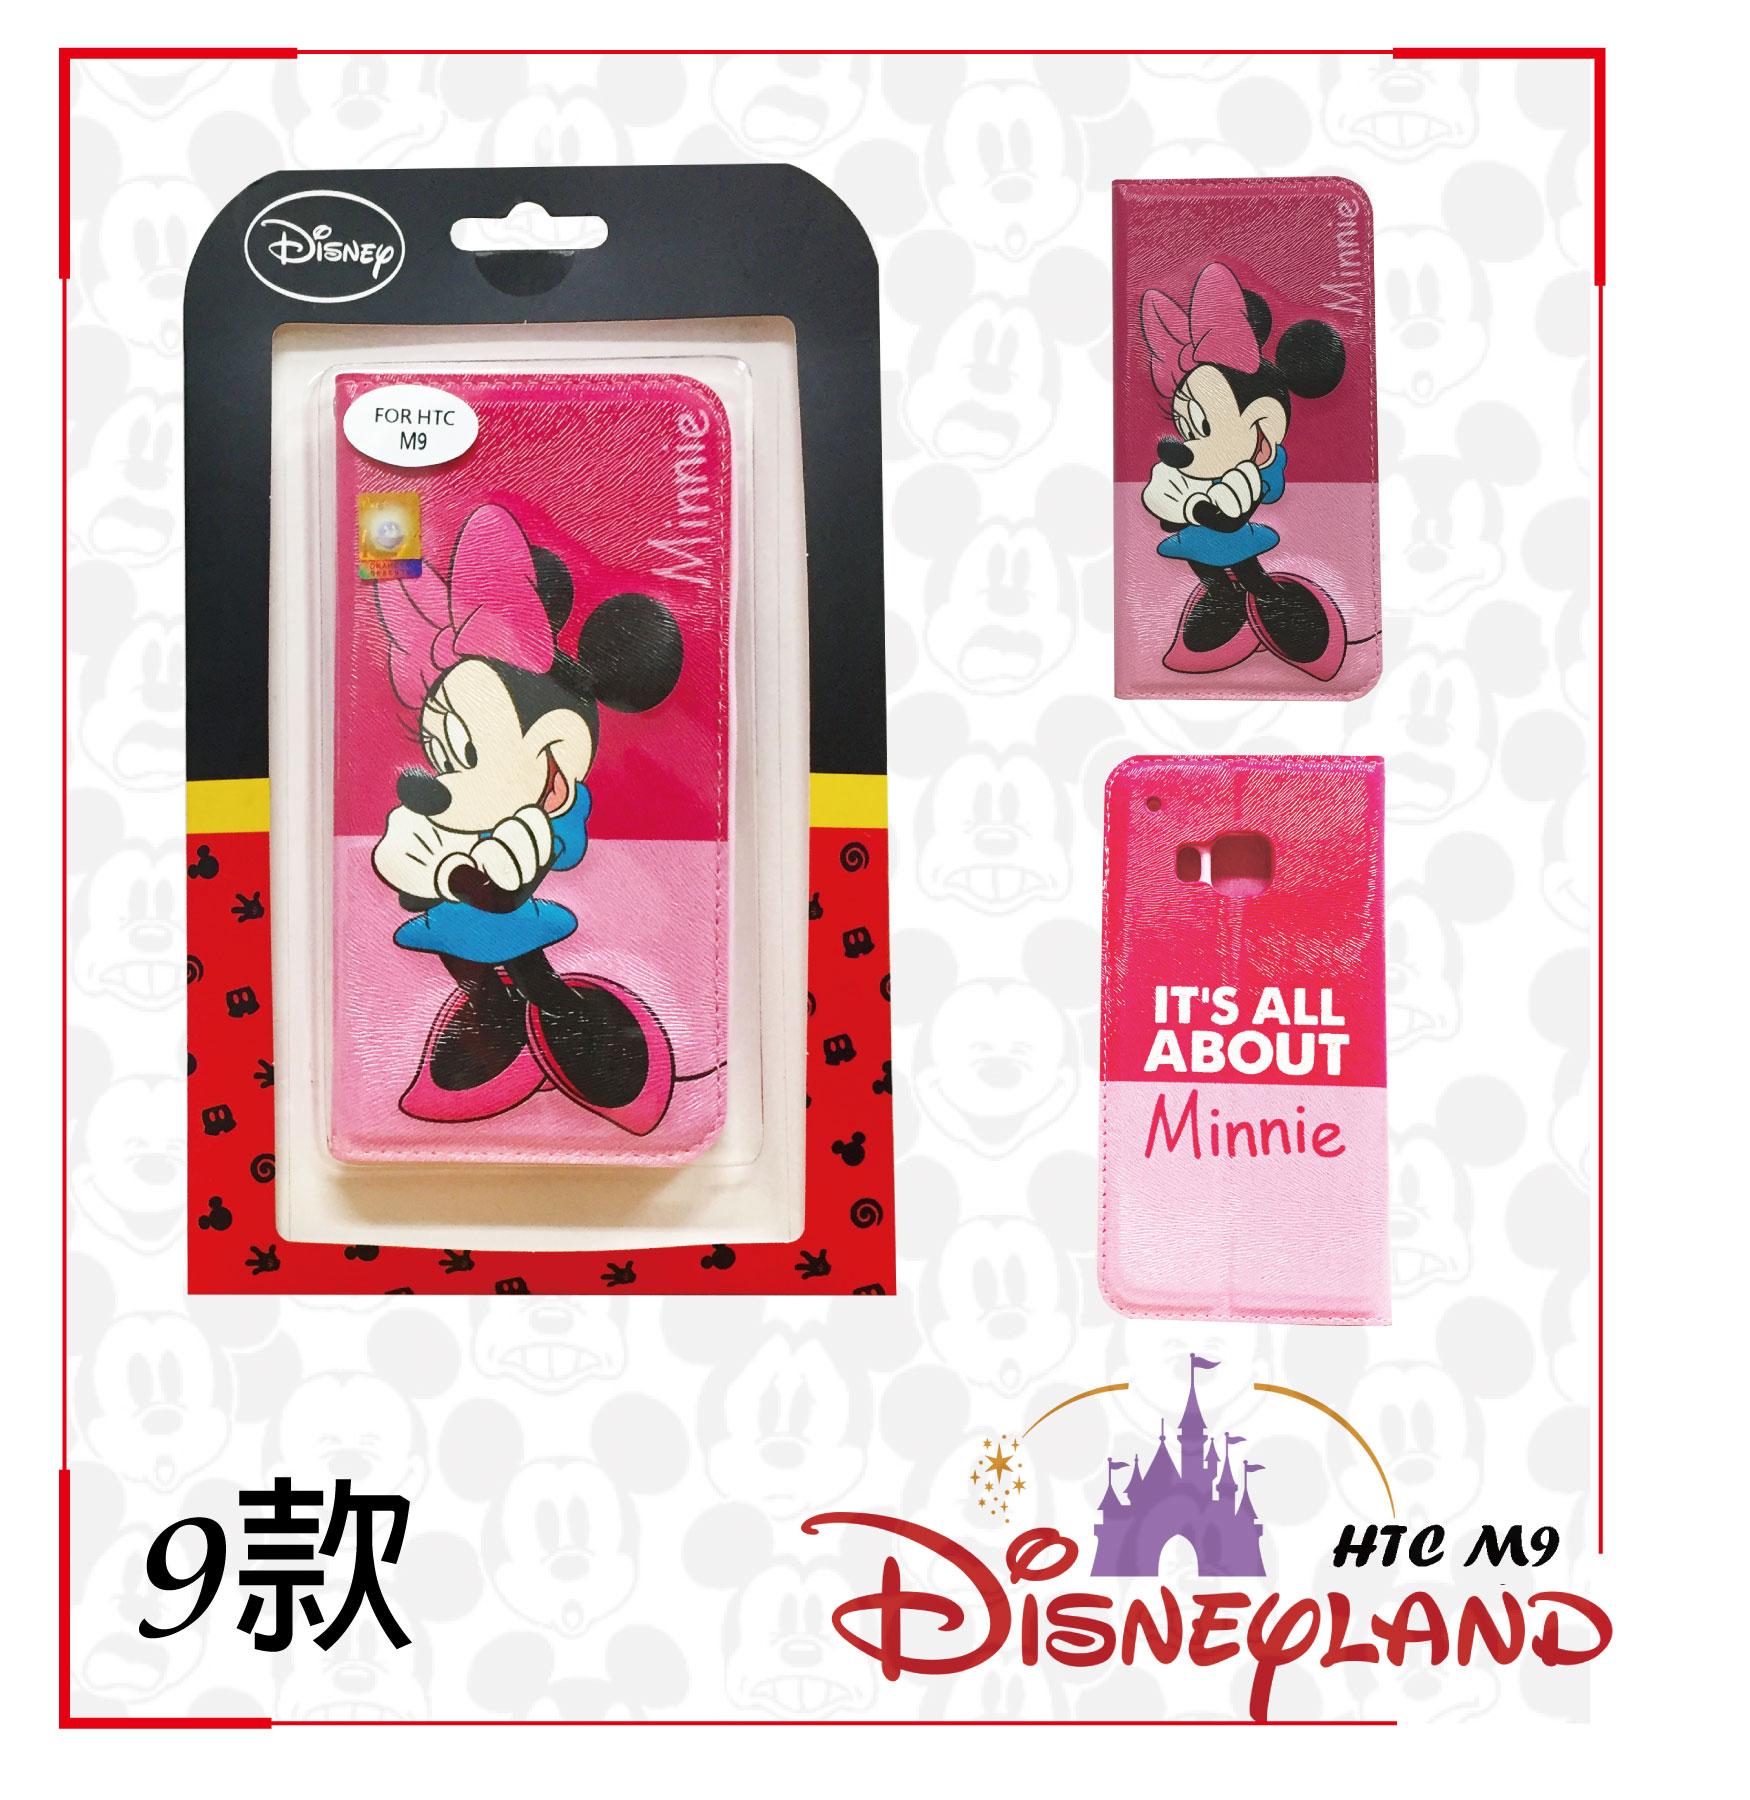 HTC M9 手機殼 Disney迪士尼正版授權 立體皮套 軟殼 米奇 米妮 奇奇蒂蒂